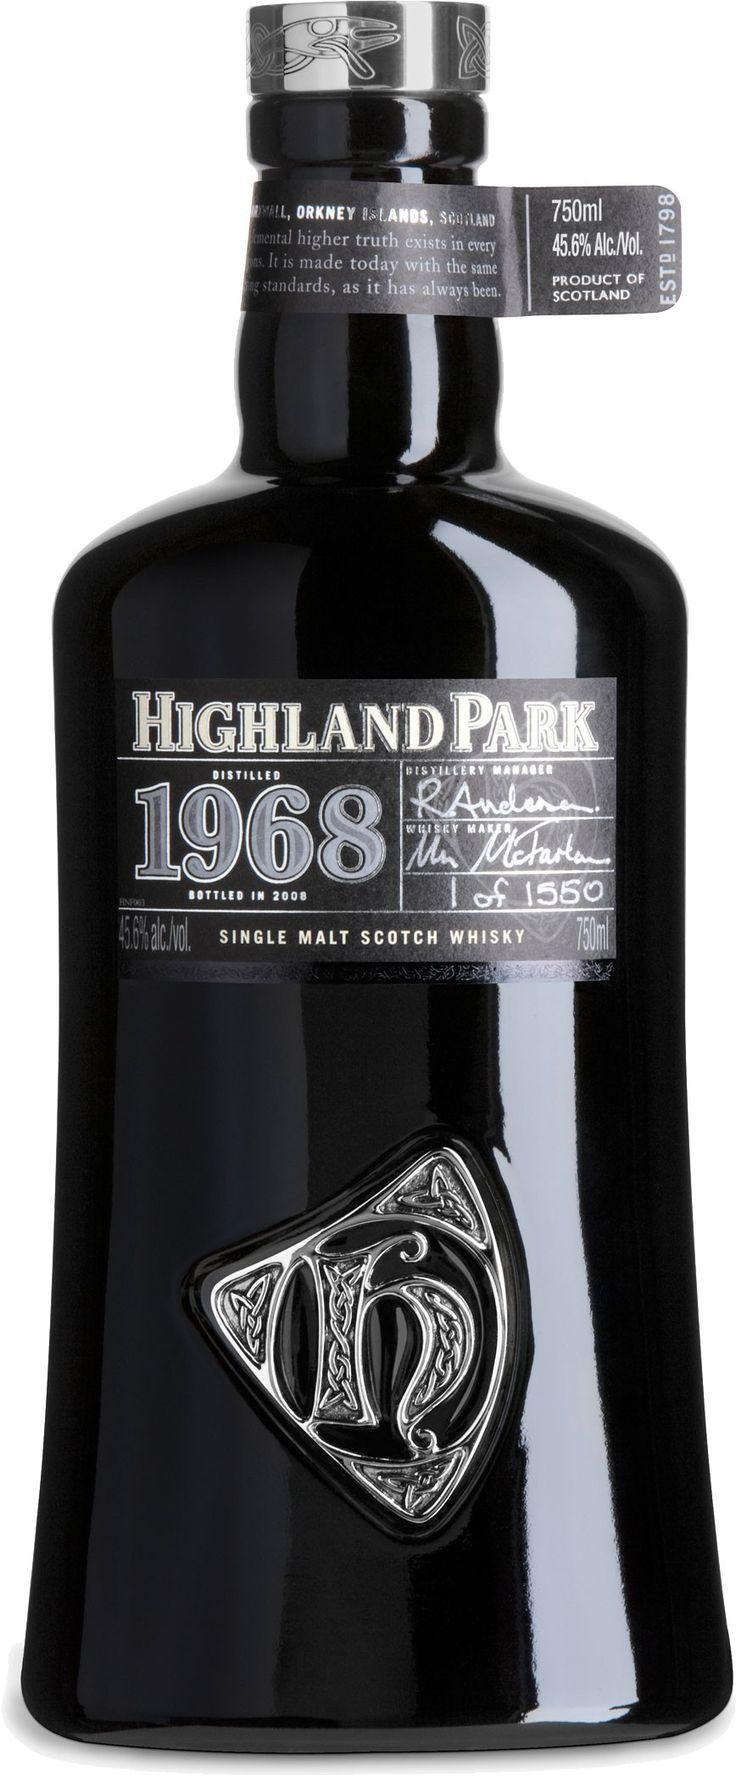 Highland Park 1968 Orcadian Vintage Single Malt Scotch Whisky | @Caskers